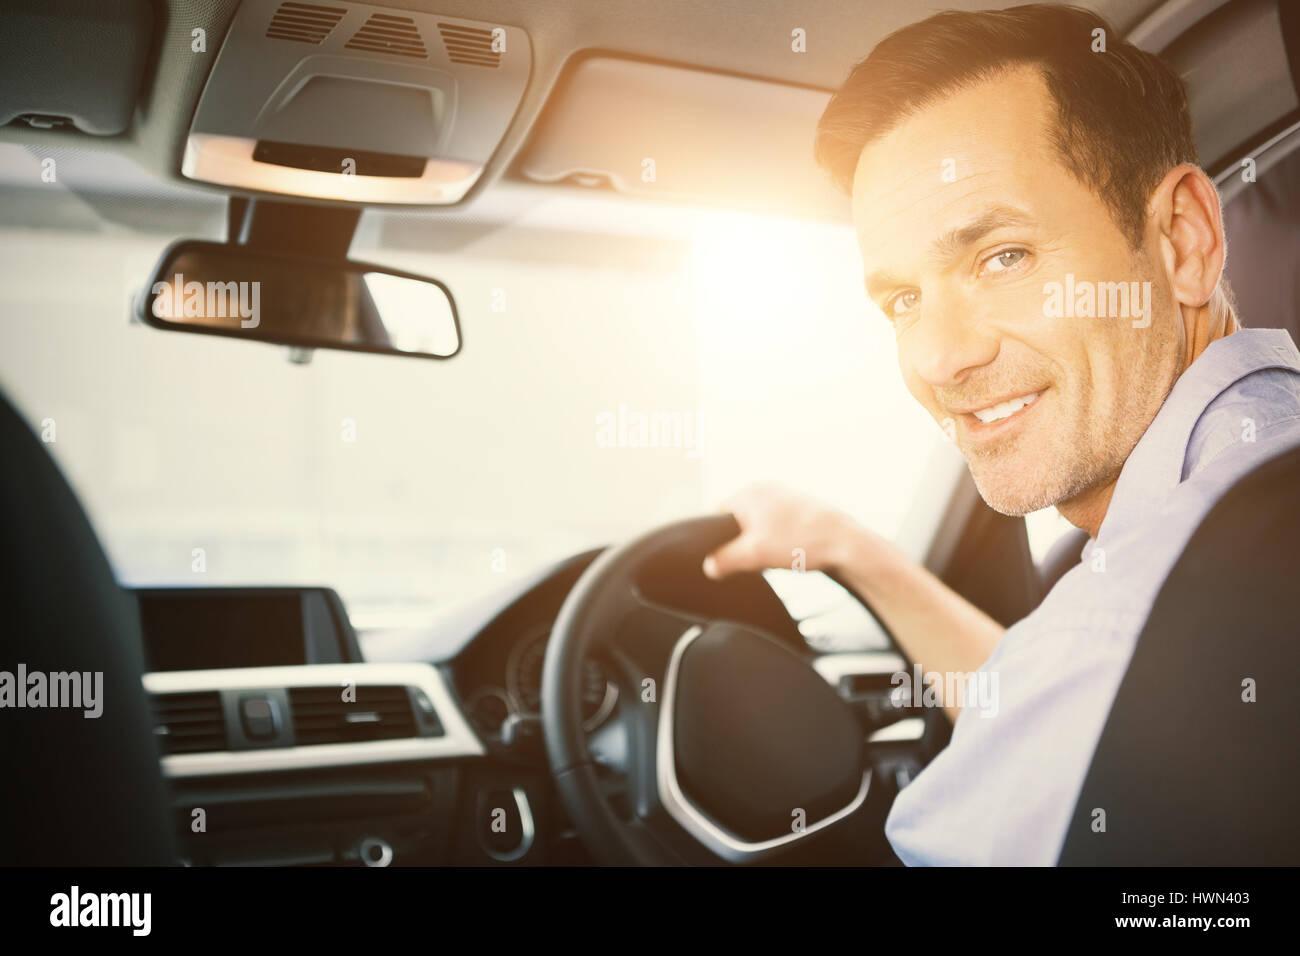 Men driving a car - Stock Image